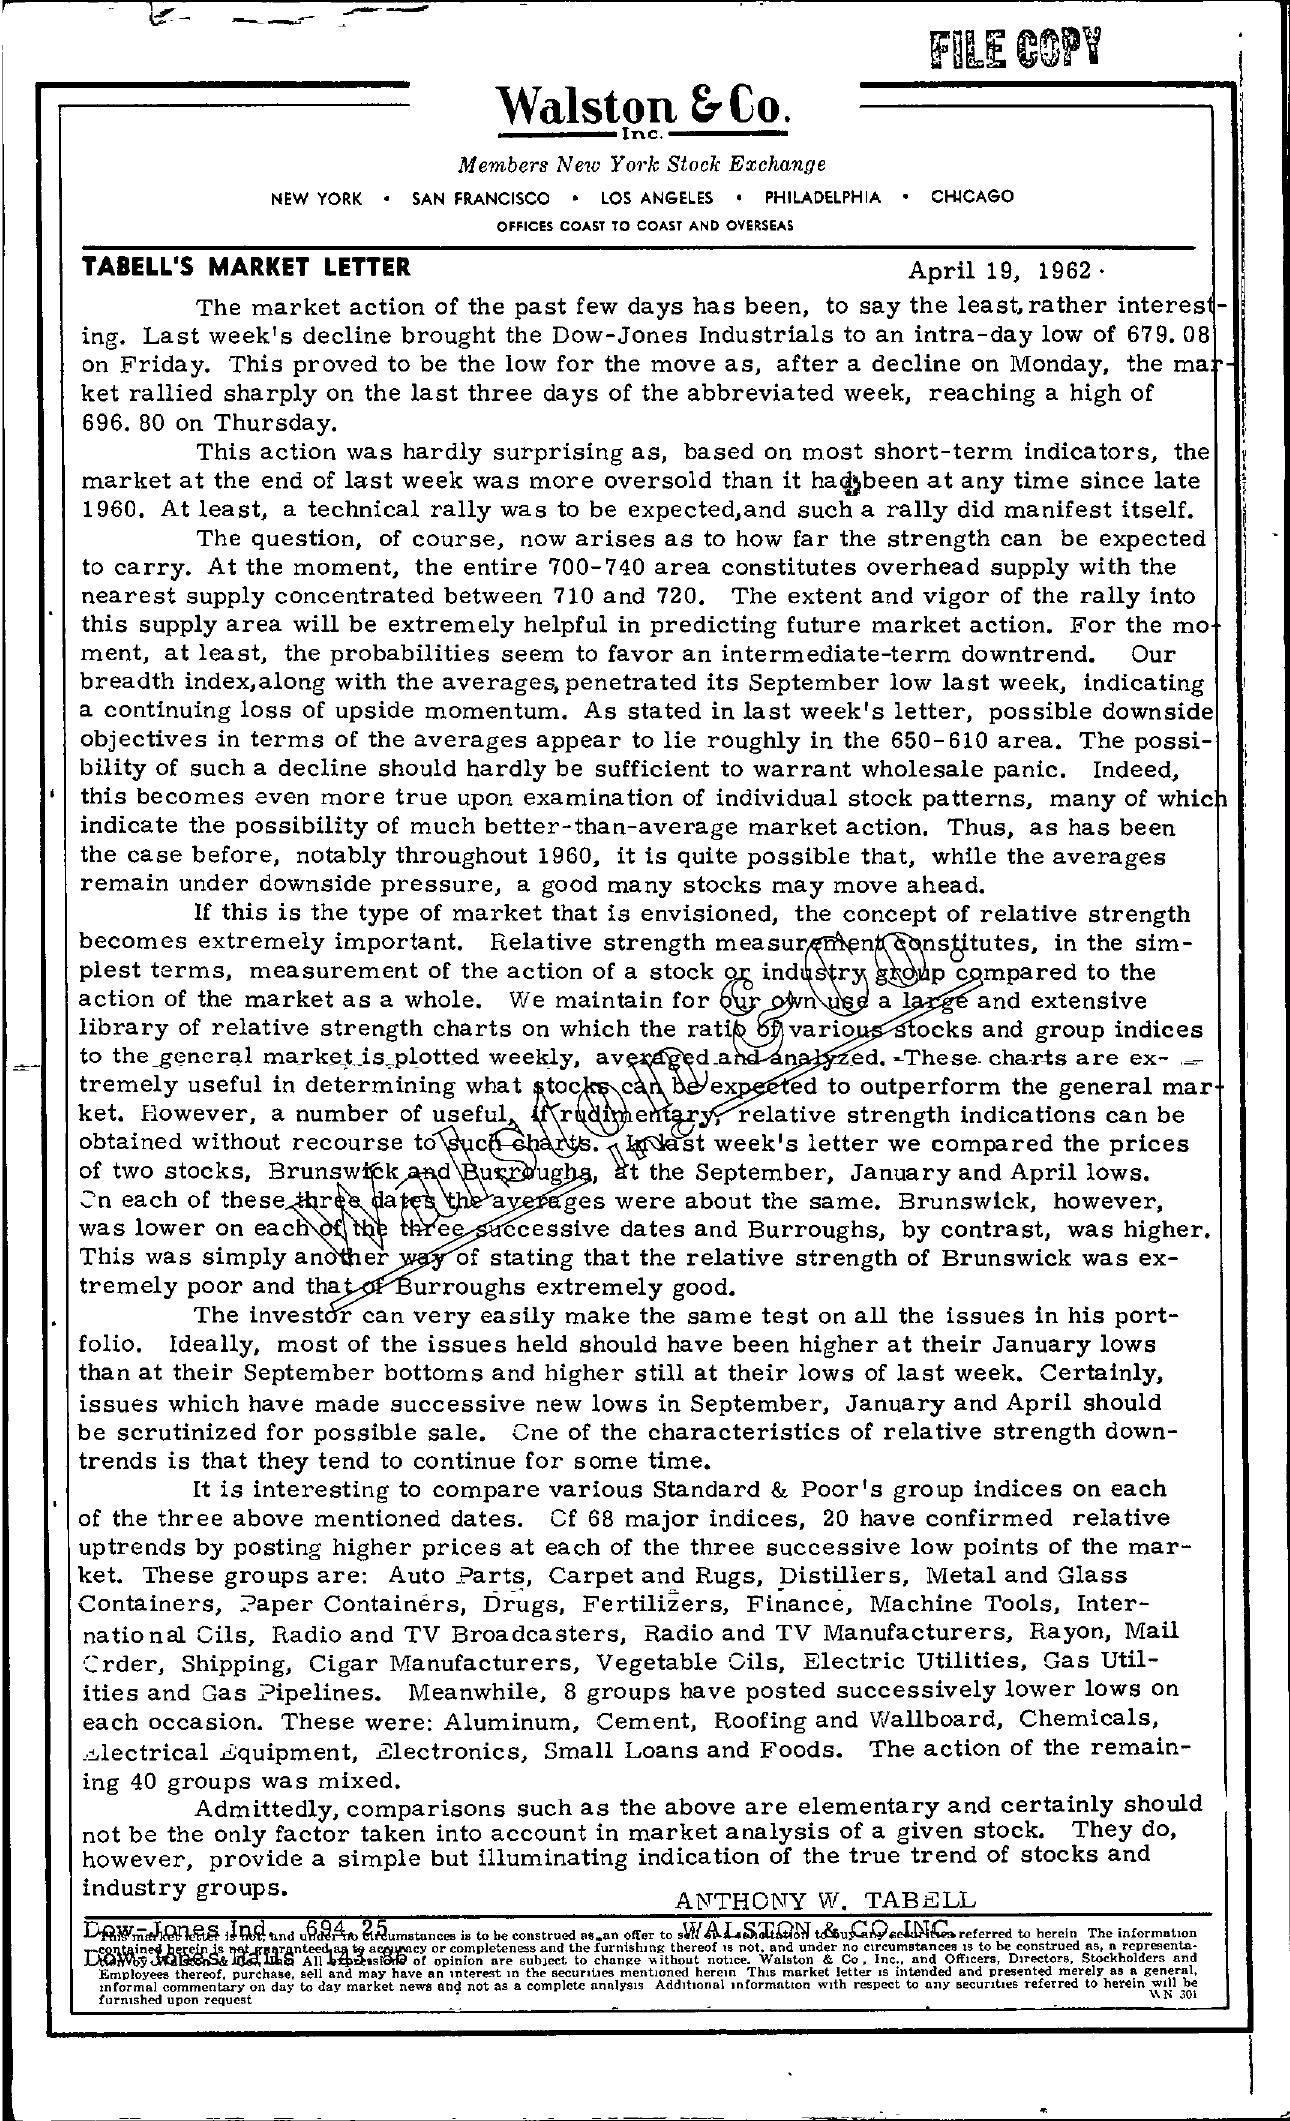 Tabell's Market Letter - April 19, 1962